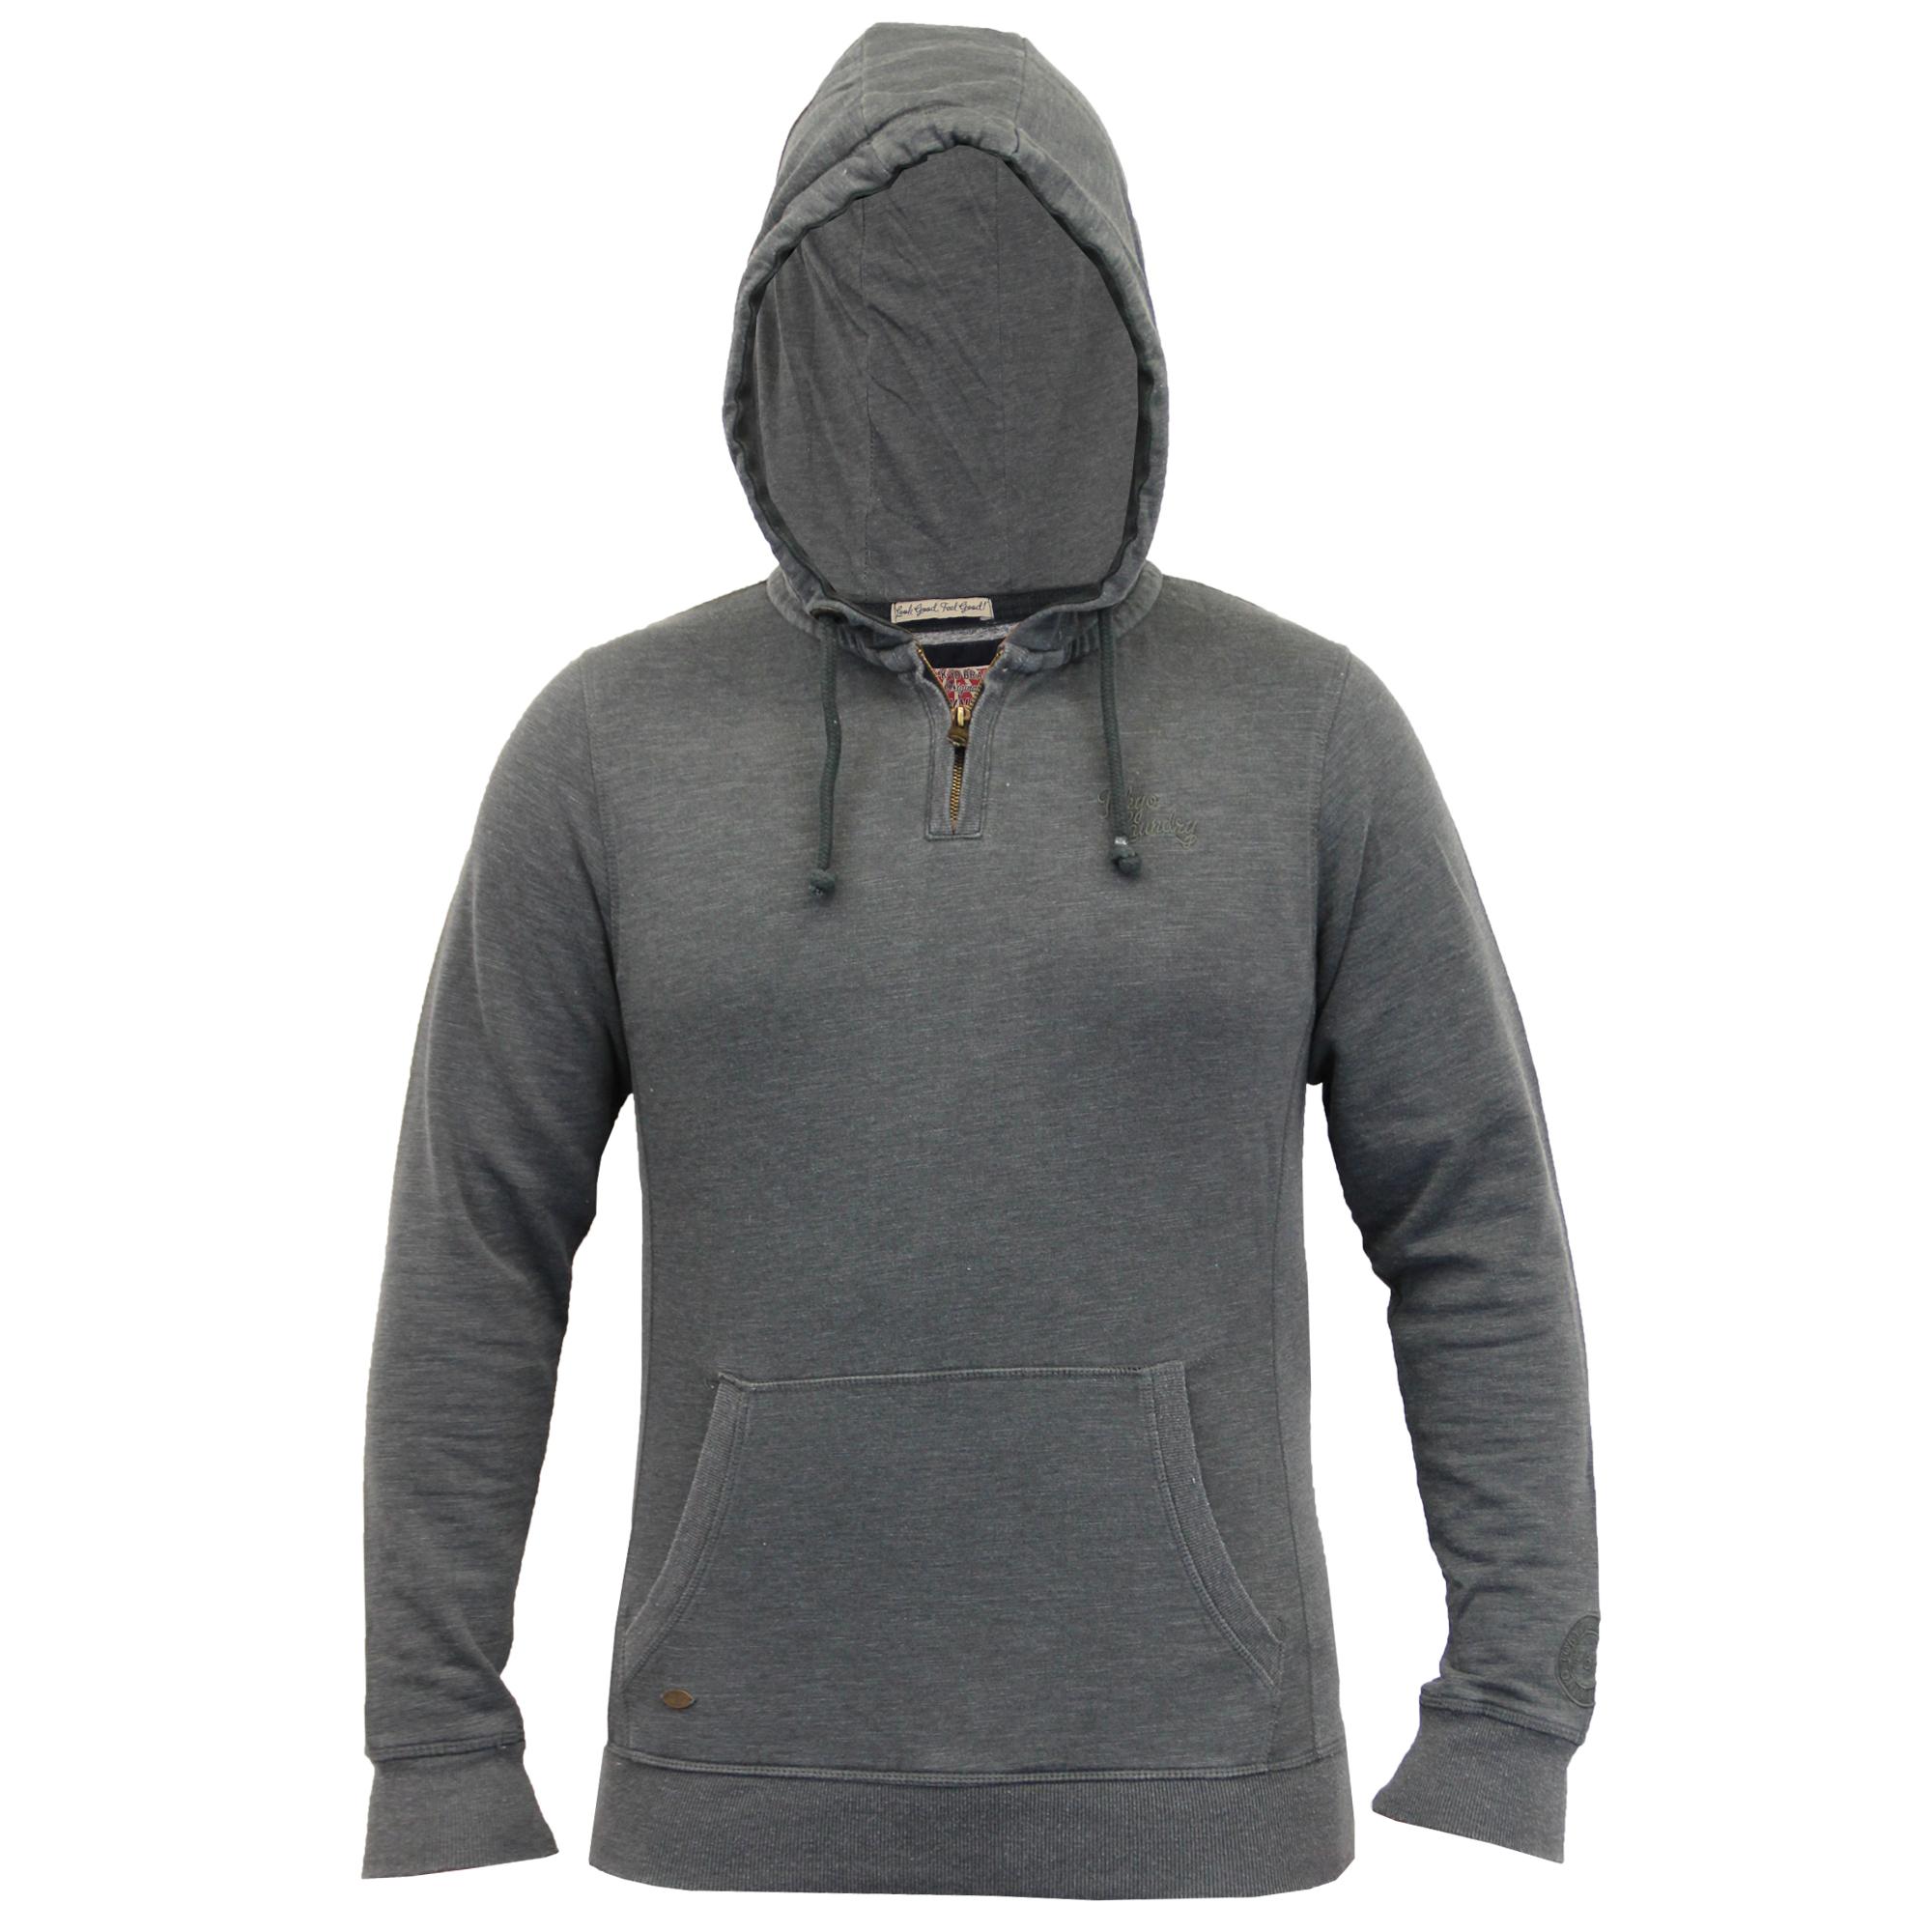 Mens-Sweatshirt-Tokyo-Laundry-Hooded-Top-Sweat-Applique-Zip-Gym-Fleece-Lined-New thumbnail 13